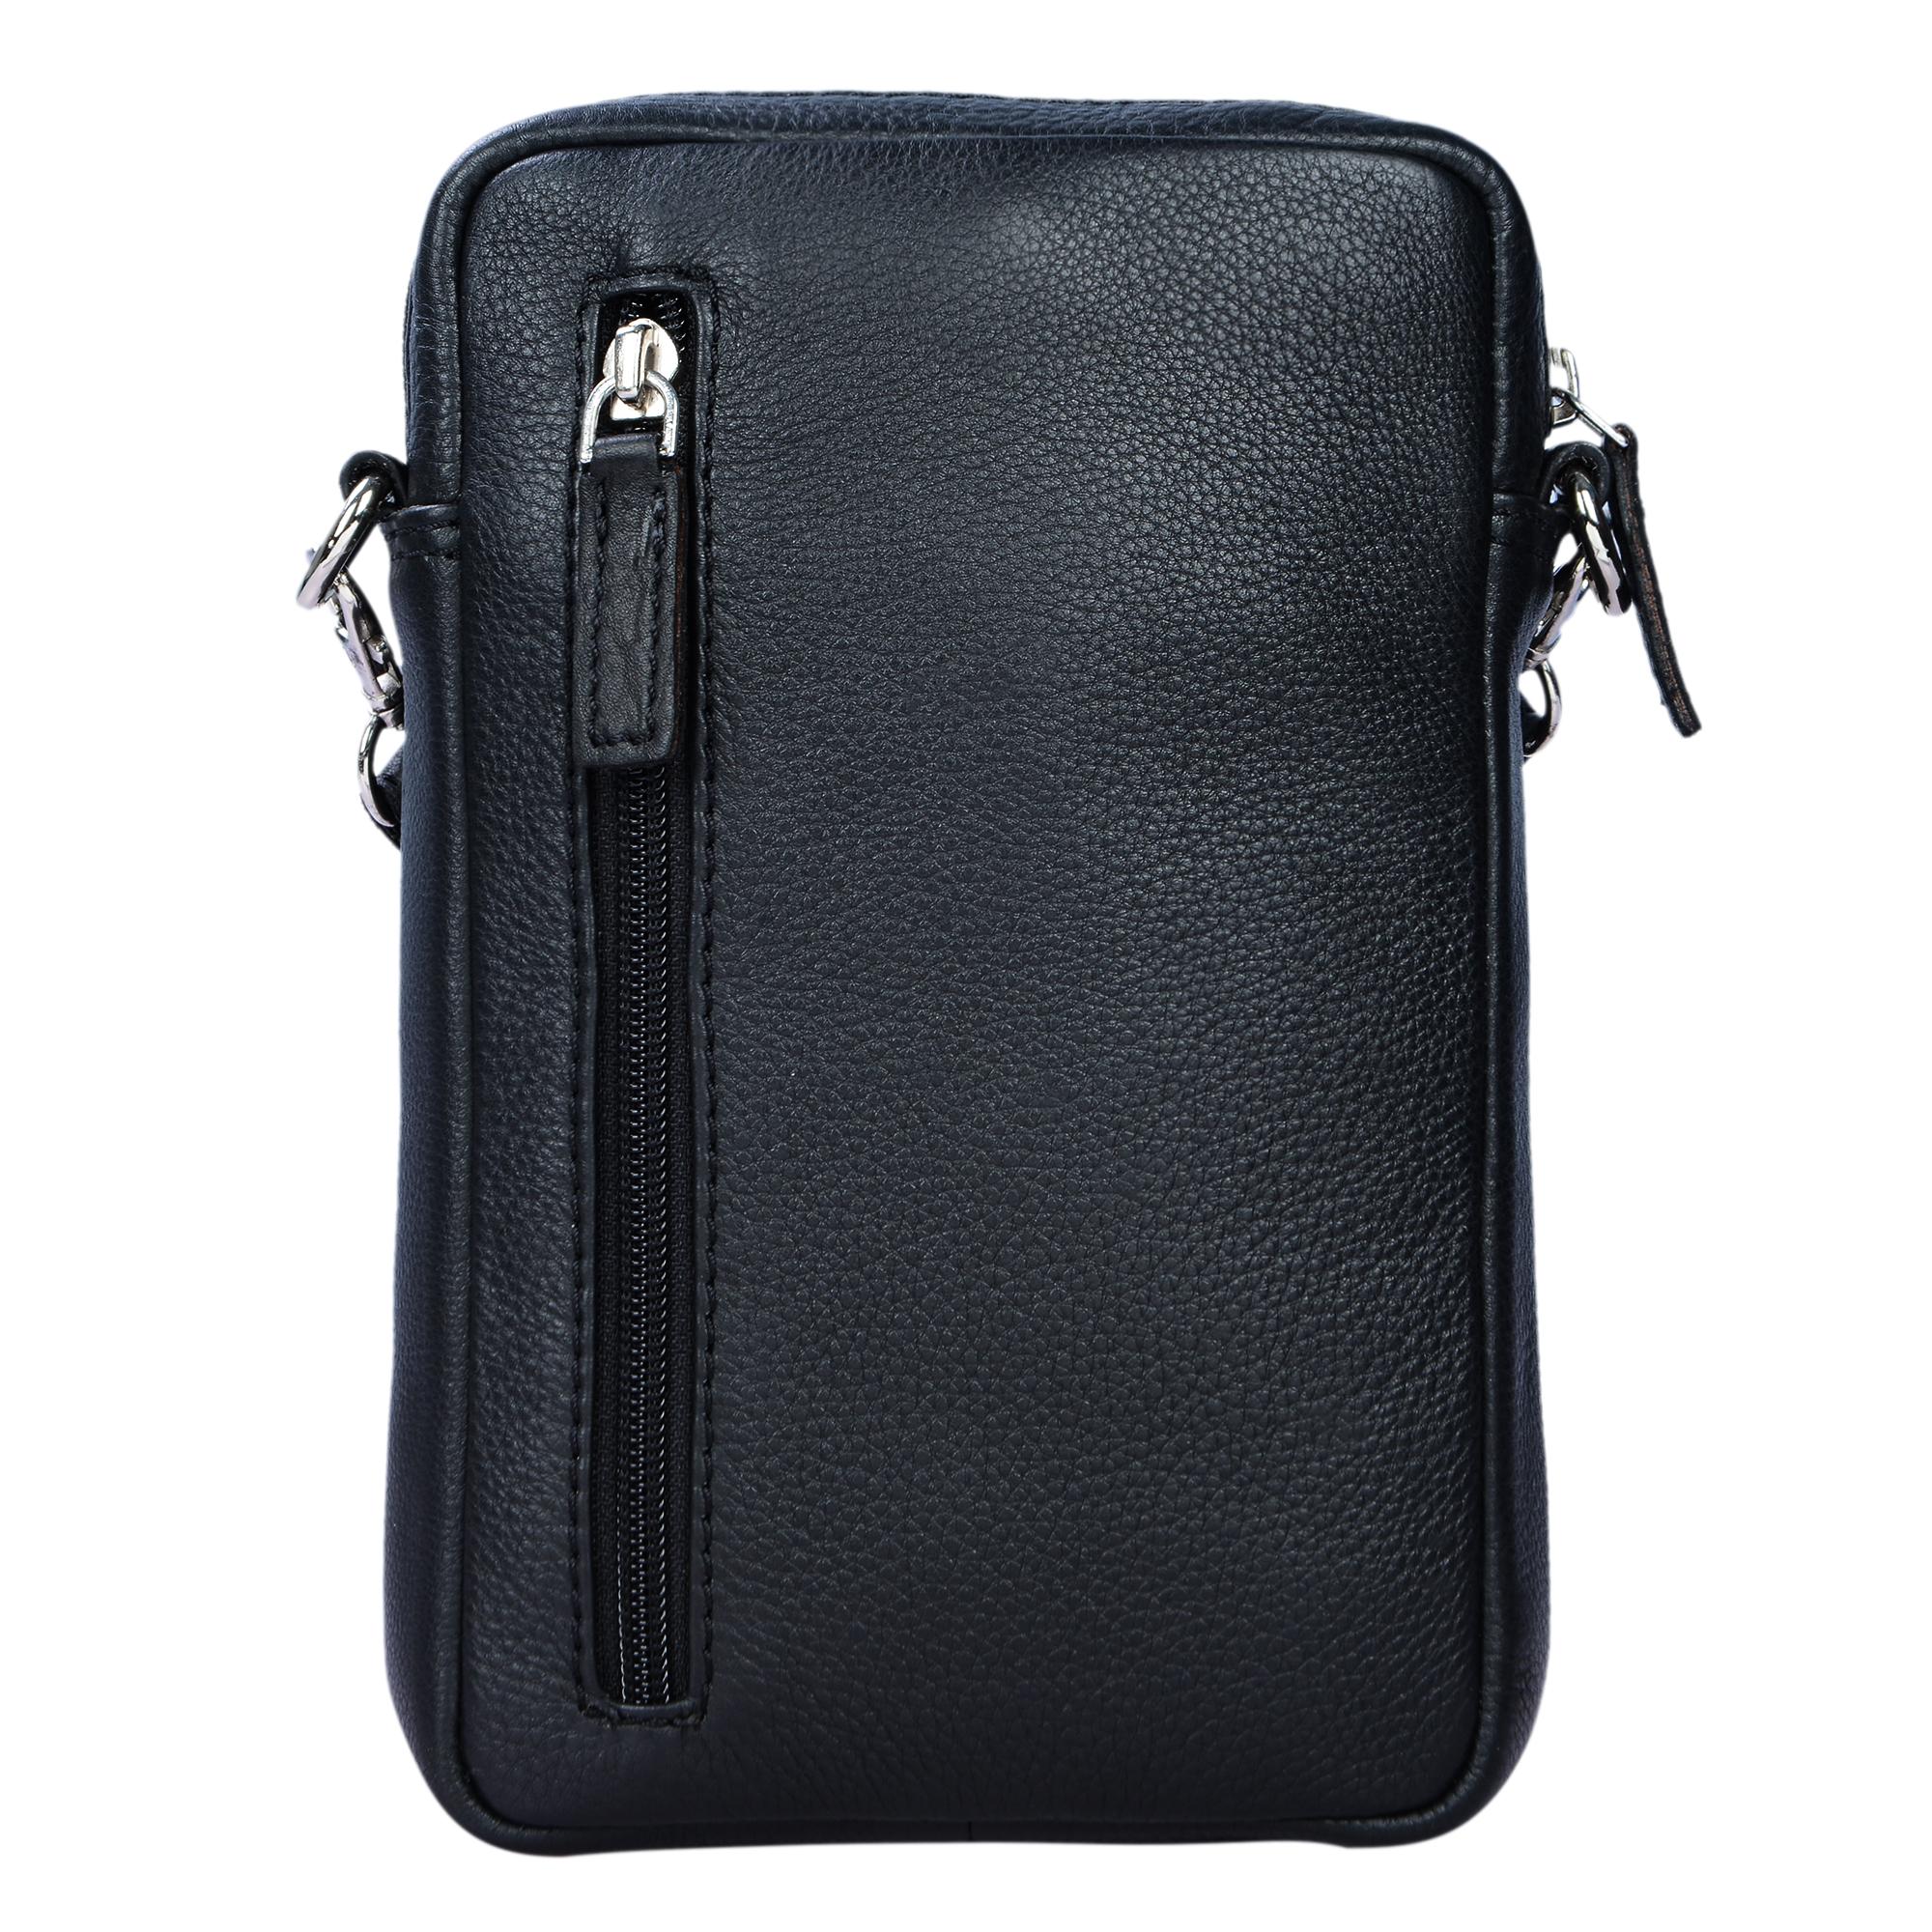 Leder Handtasche Umhängetasche Vintage